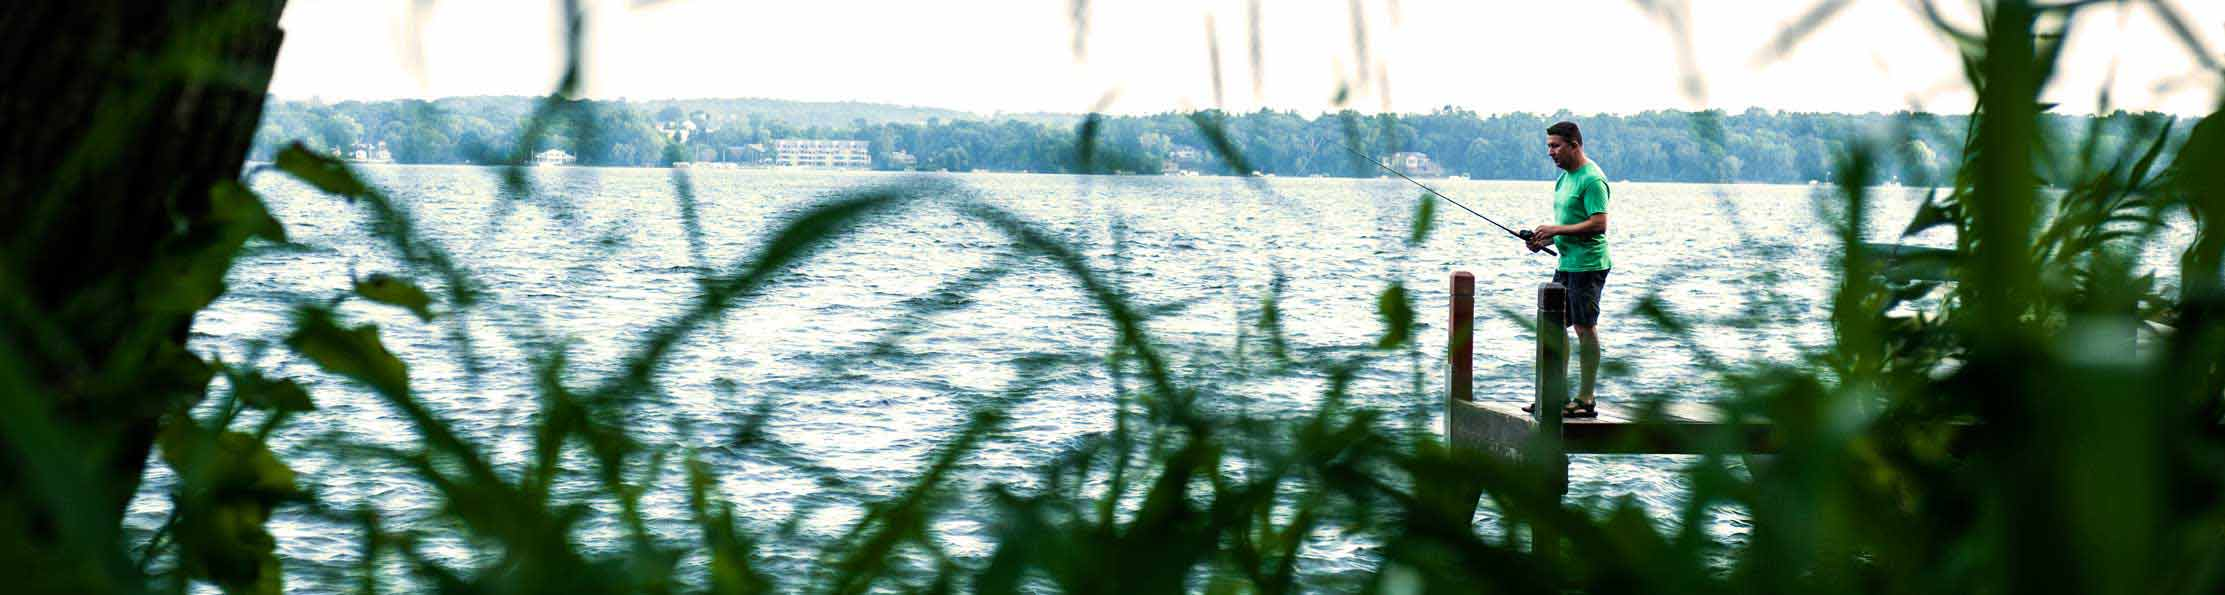 Green Lake Green Culture